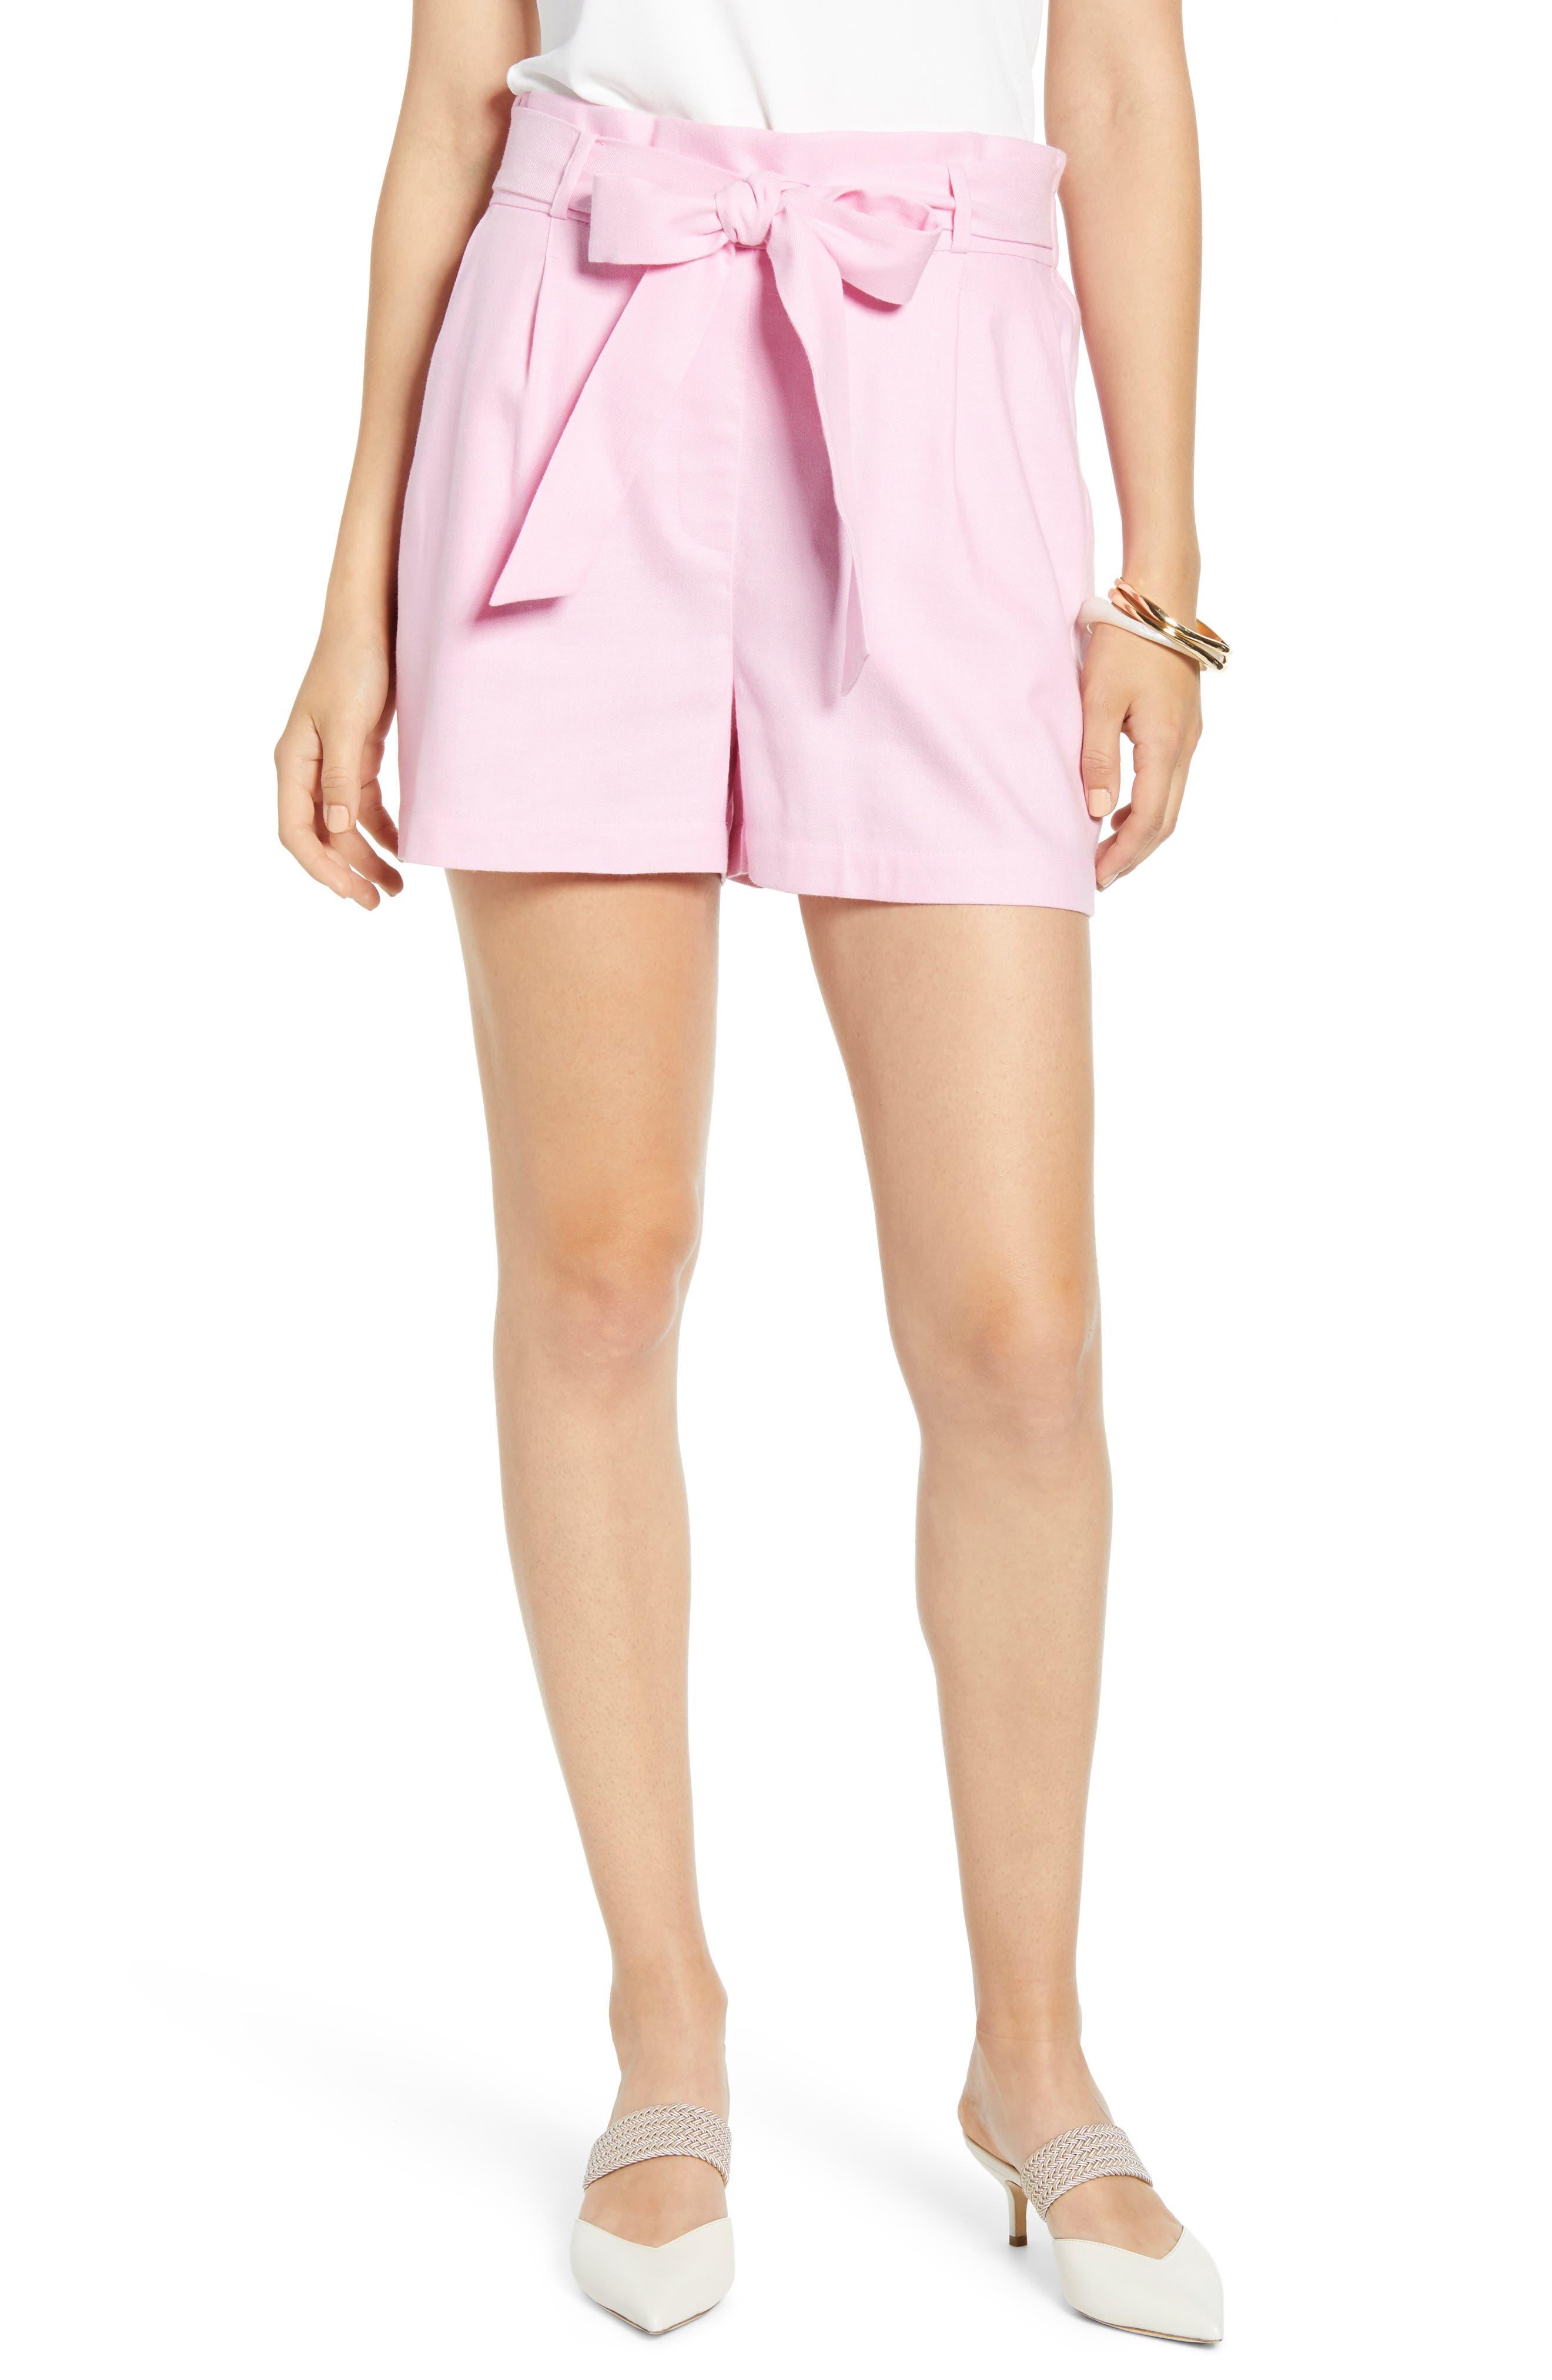 Vintage Shorts, Culottes,  Capris History Womens Halogen Tie Paperbag Waist Shorts $69.00 AT vintagedancer.com